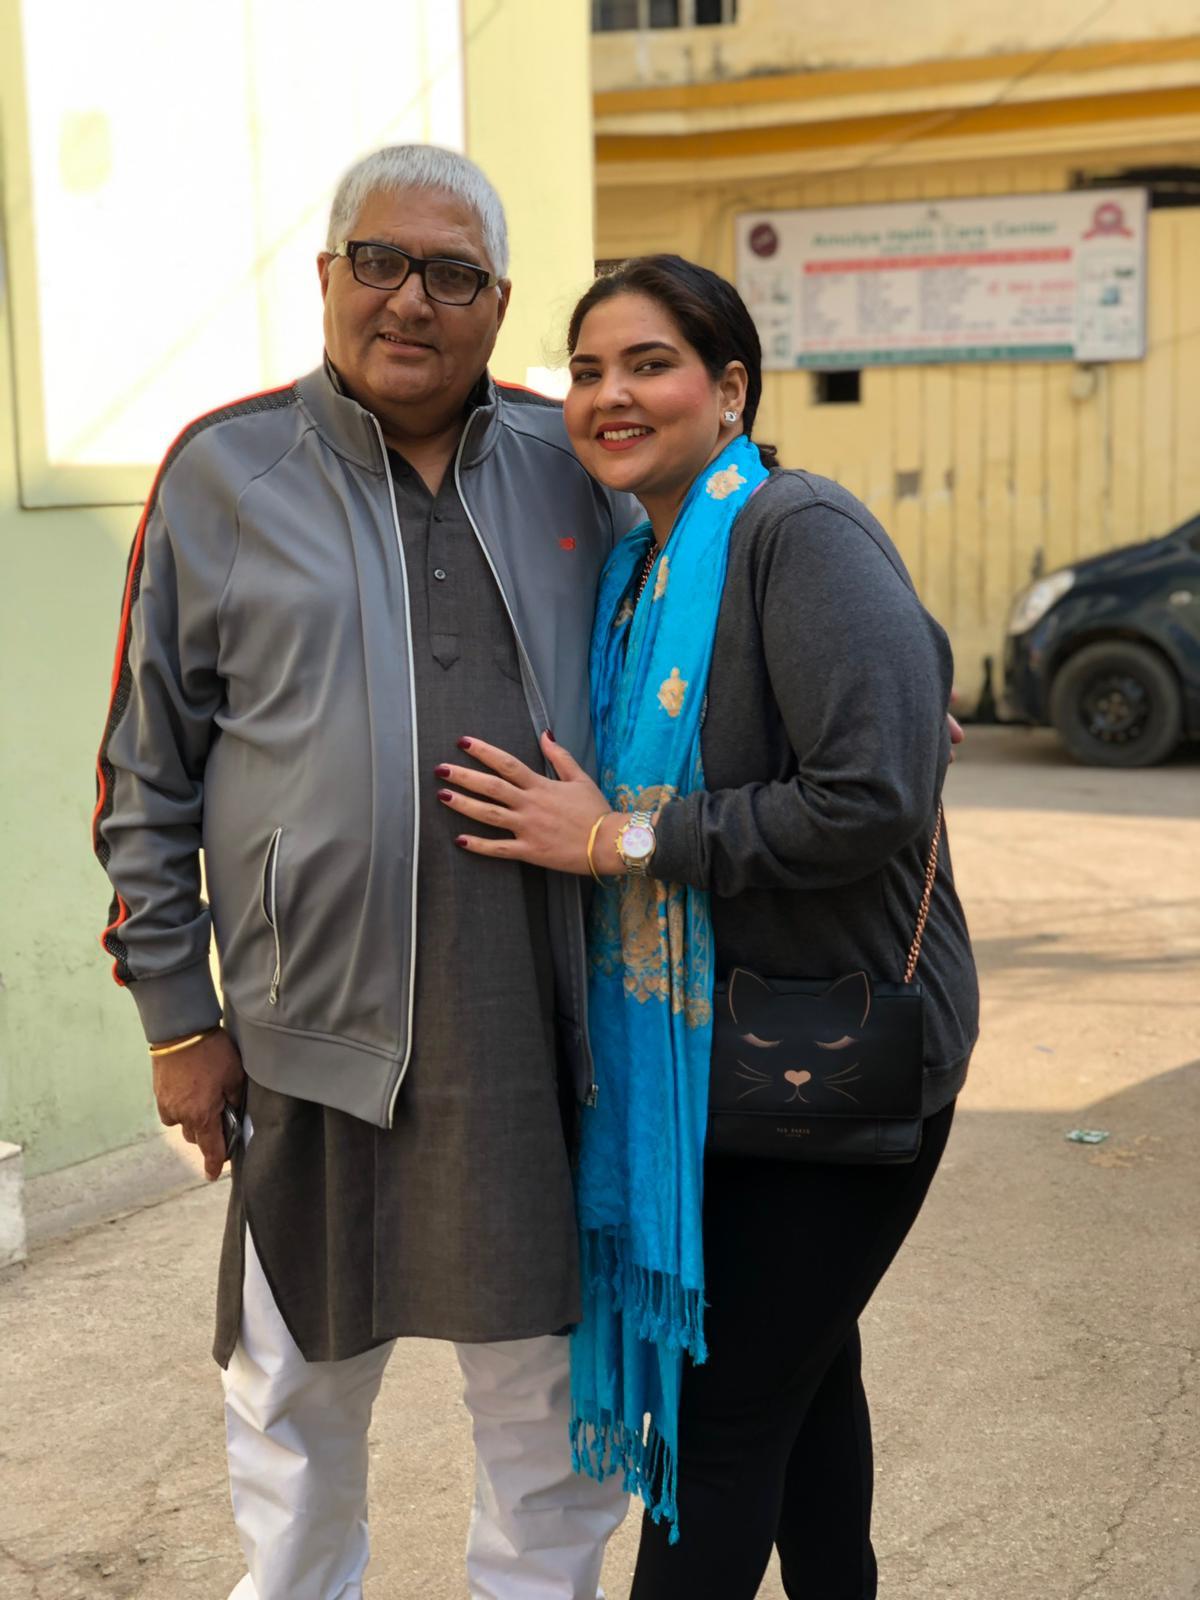 Ara Sharma Marar and her father in Gwalior, India in Jan. 2019